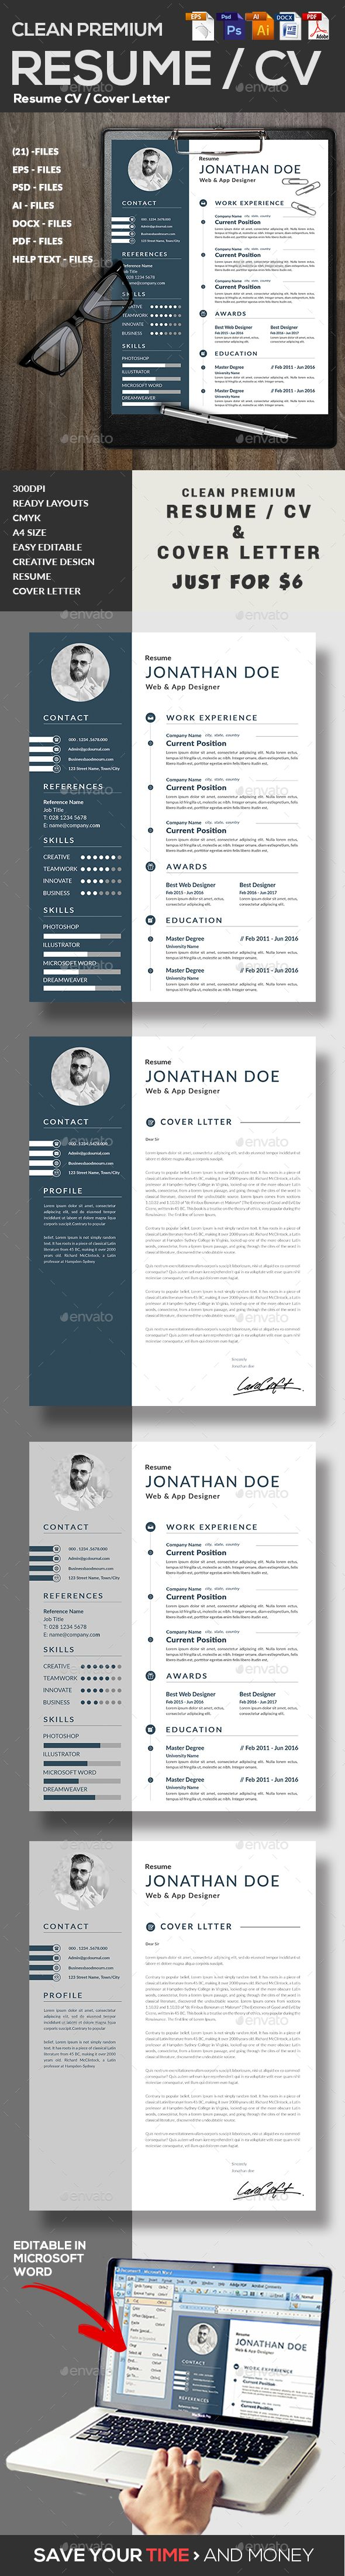 1000 ideas about resume templates on pinterest resume